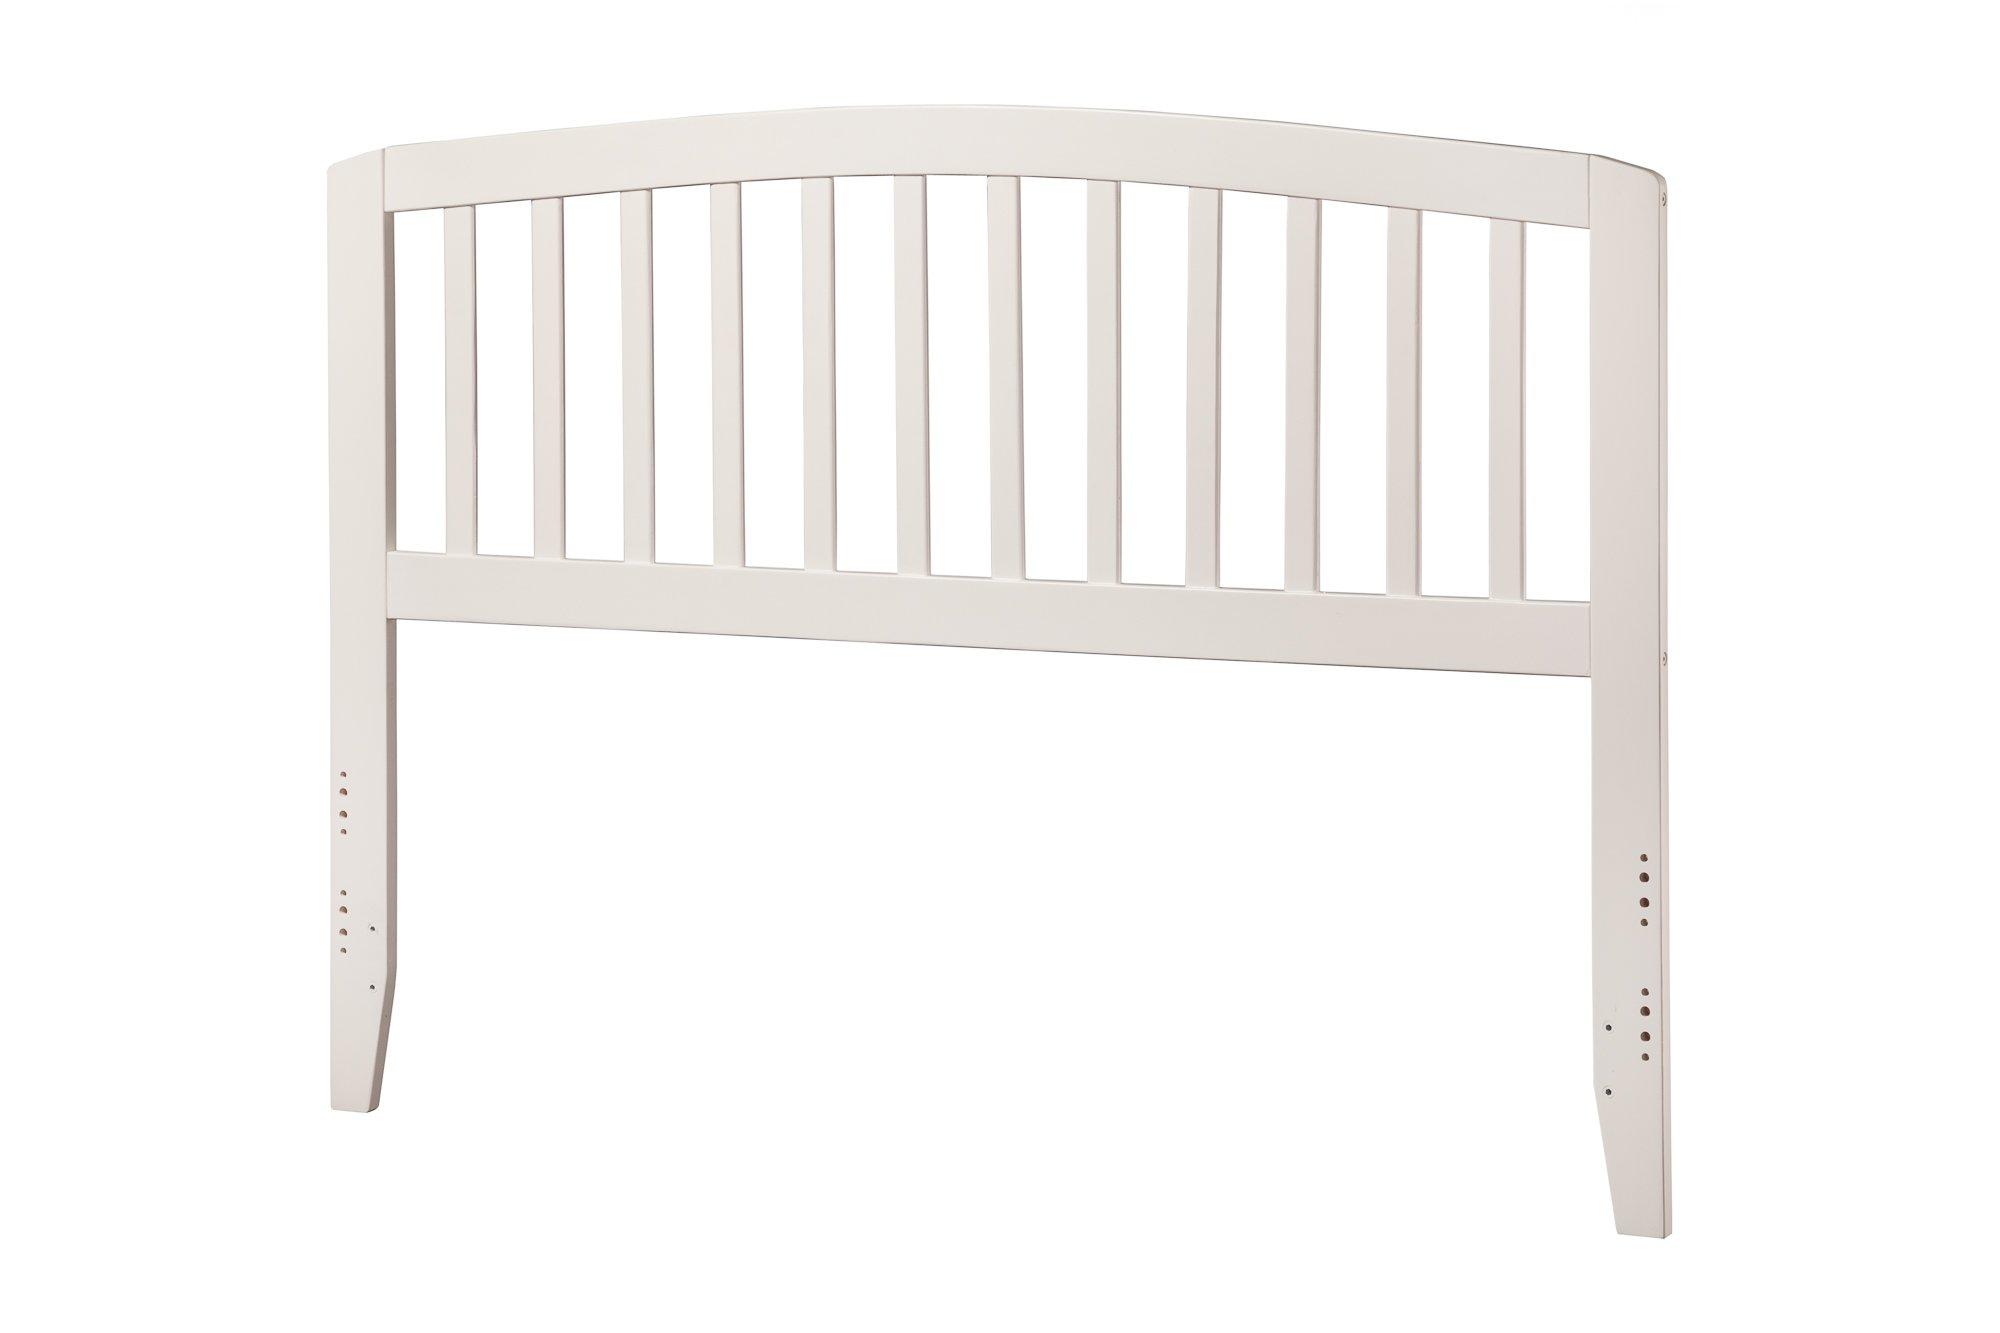 Atlantic Furniture Richmond Headboard, Full, White